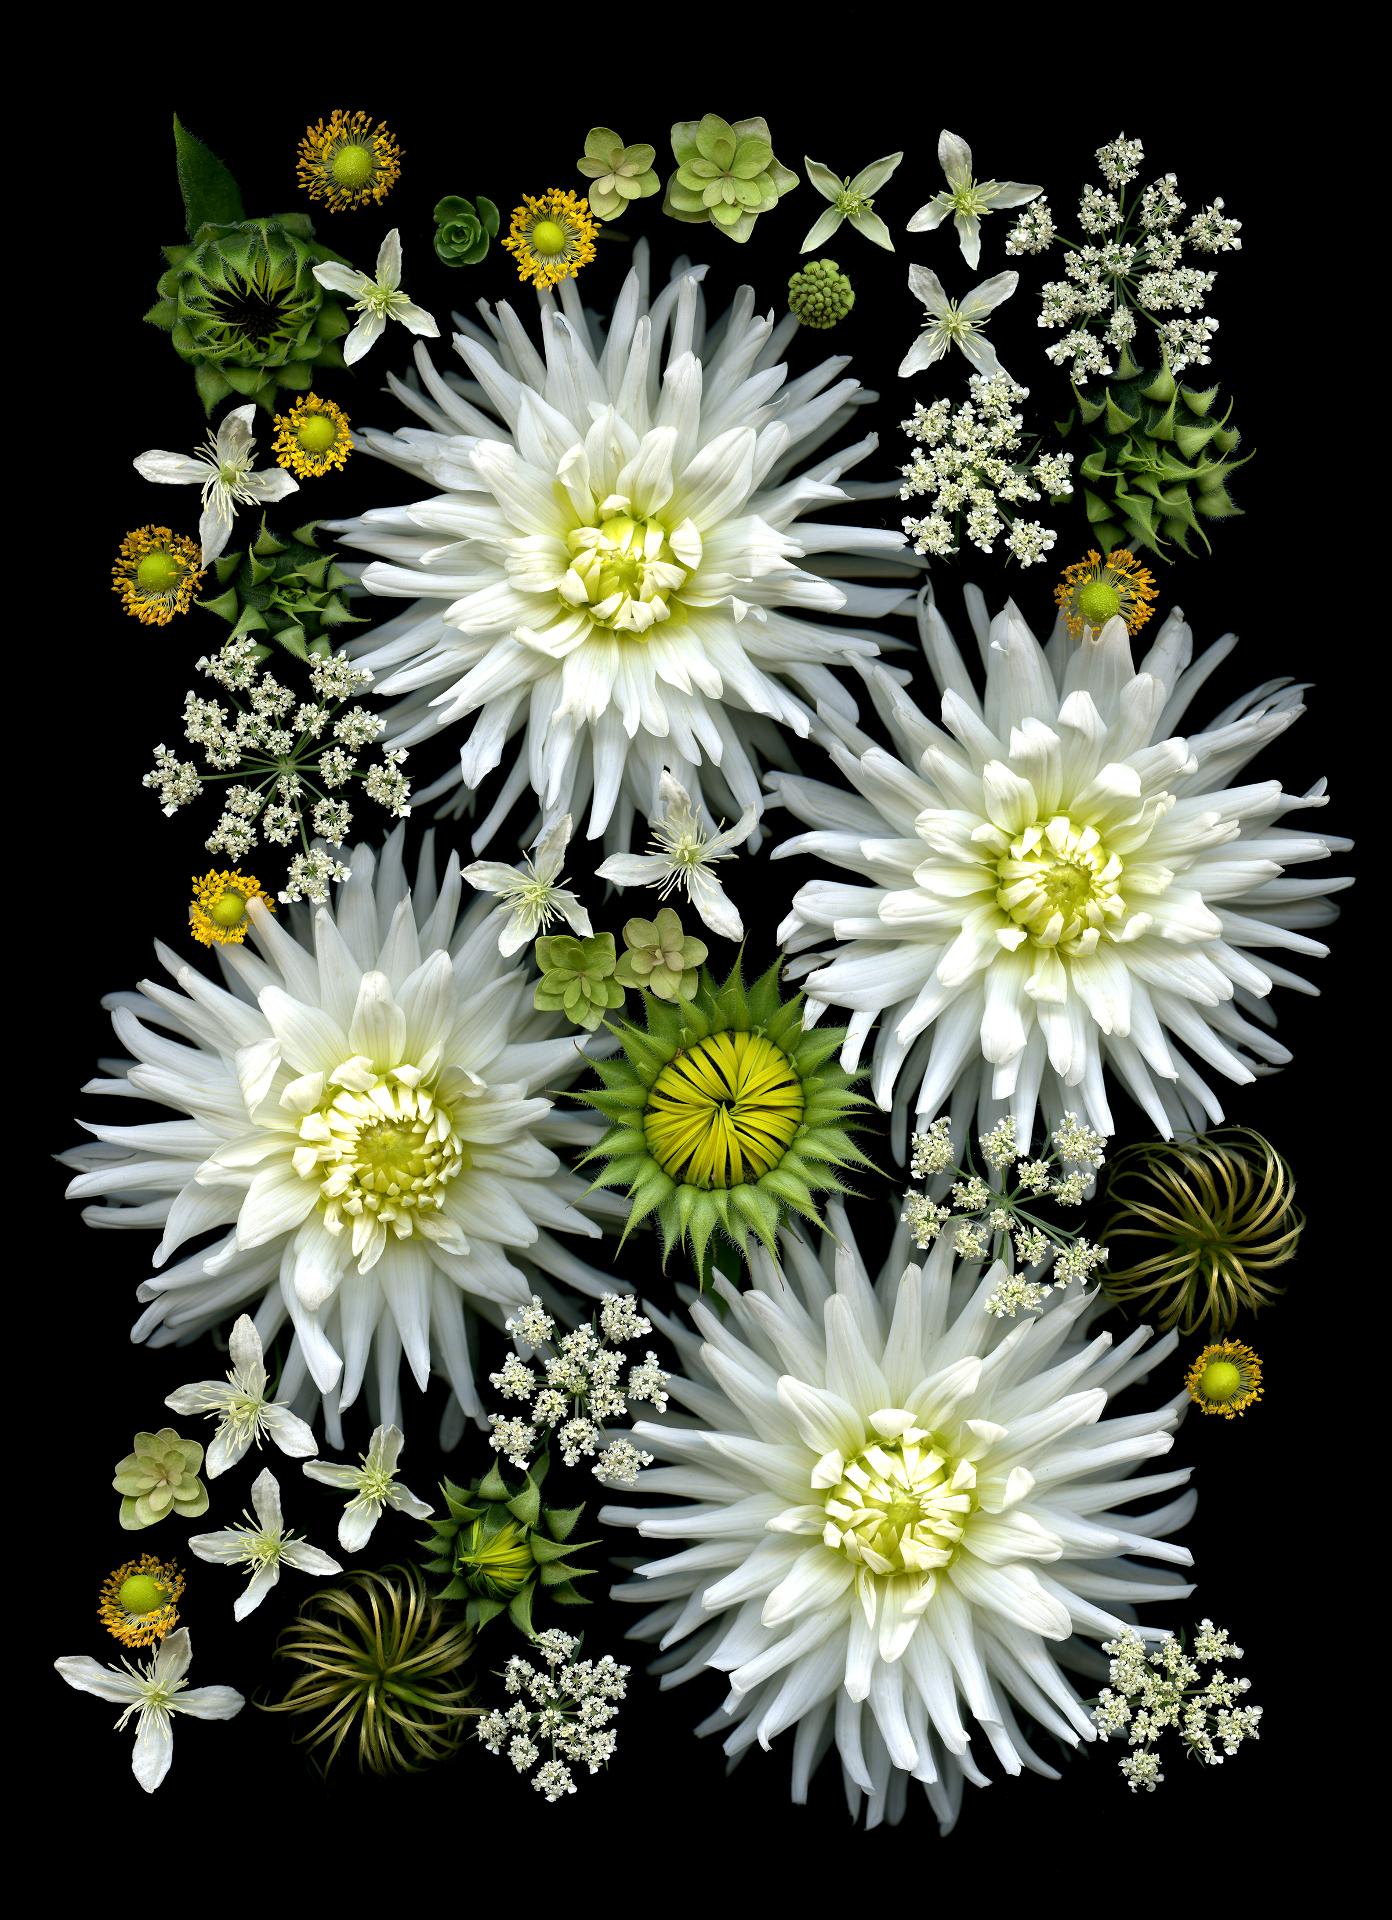 Flower Composition 17